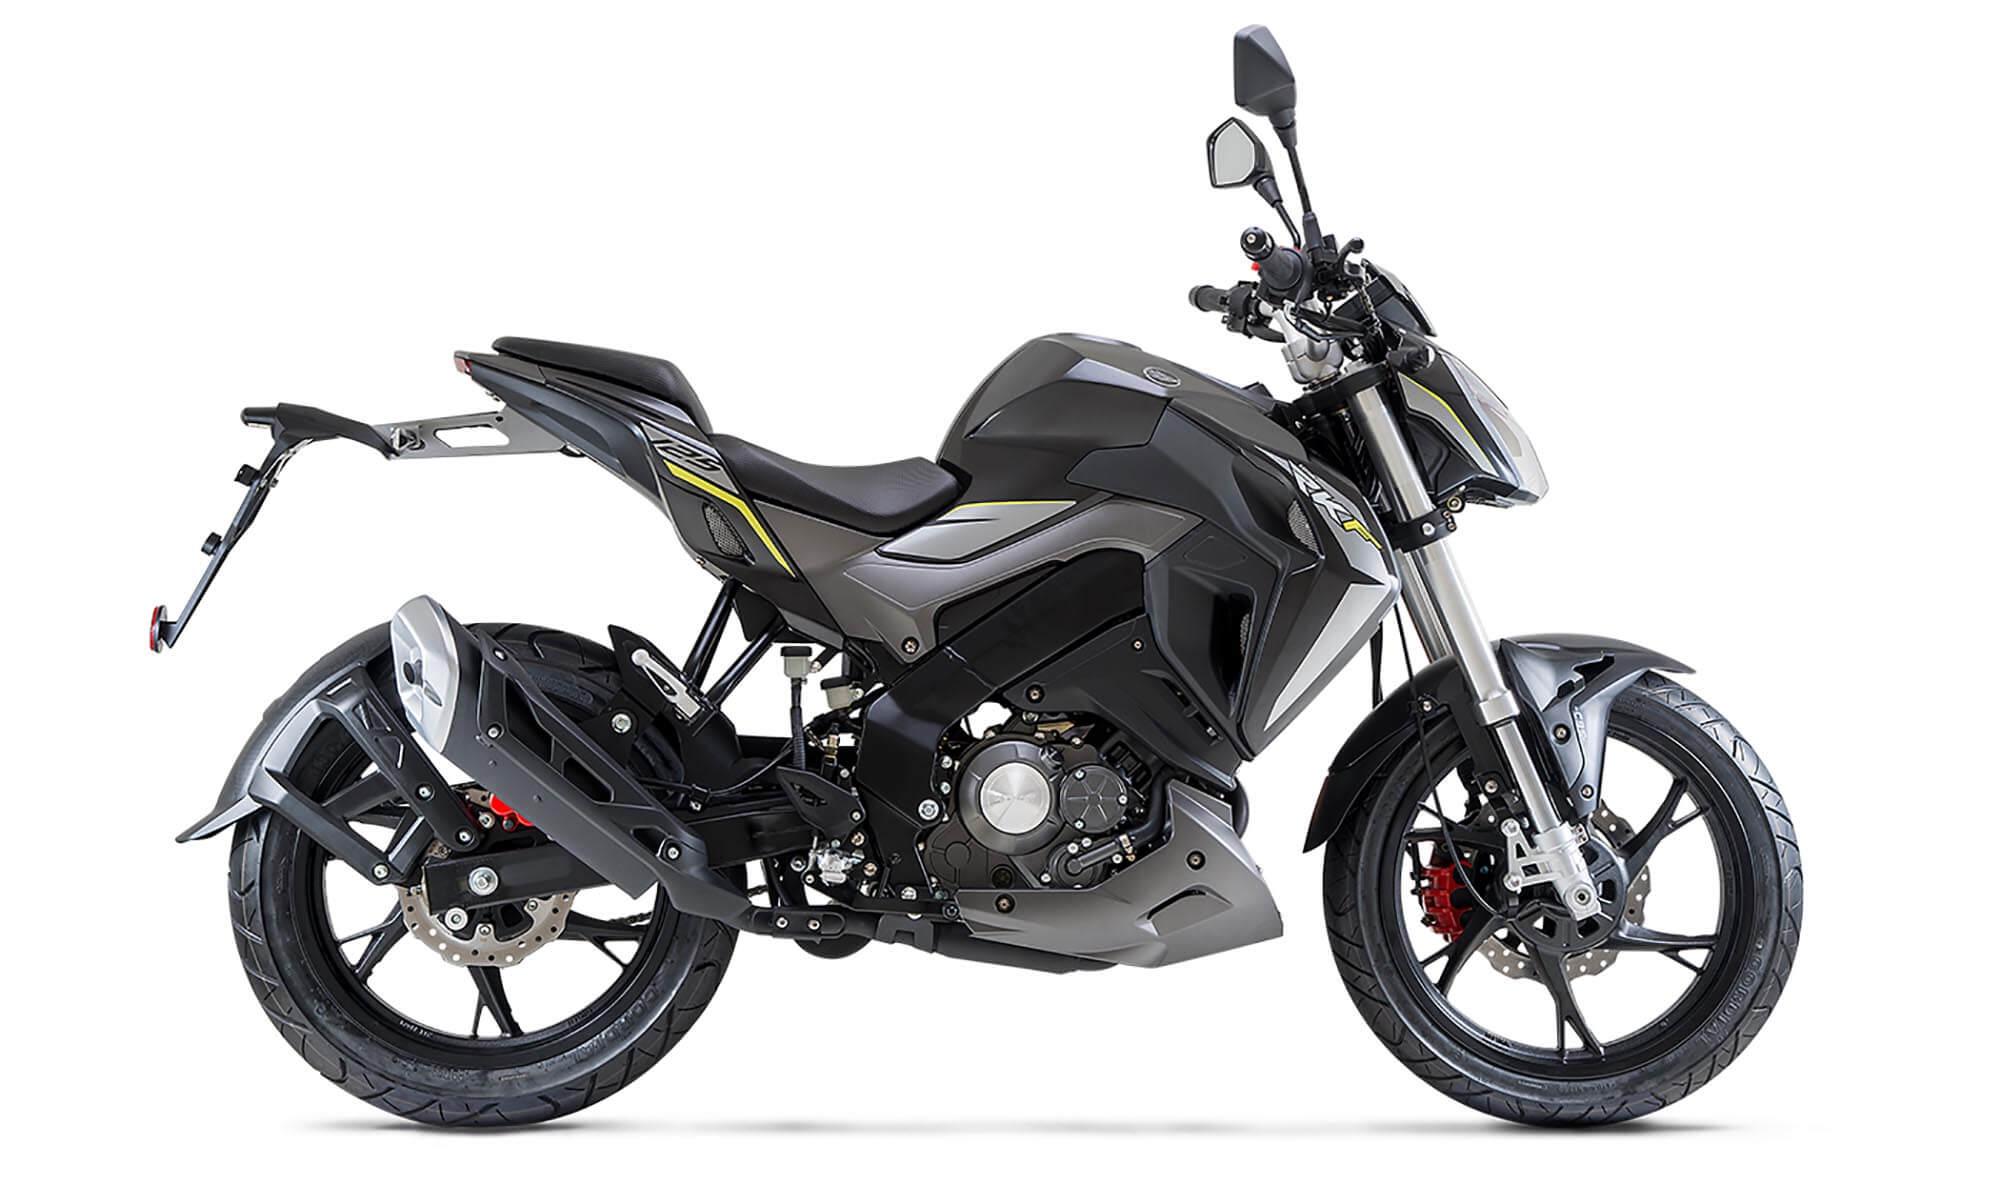 comprar-motos-keeway-rkf-125-negro-motissimo-barcelona